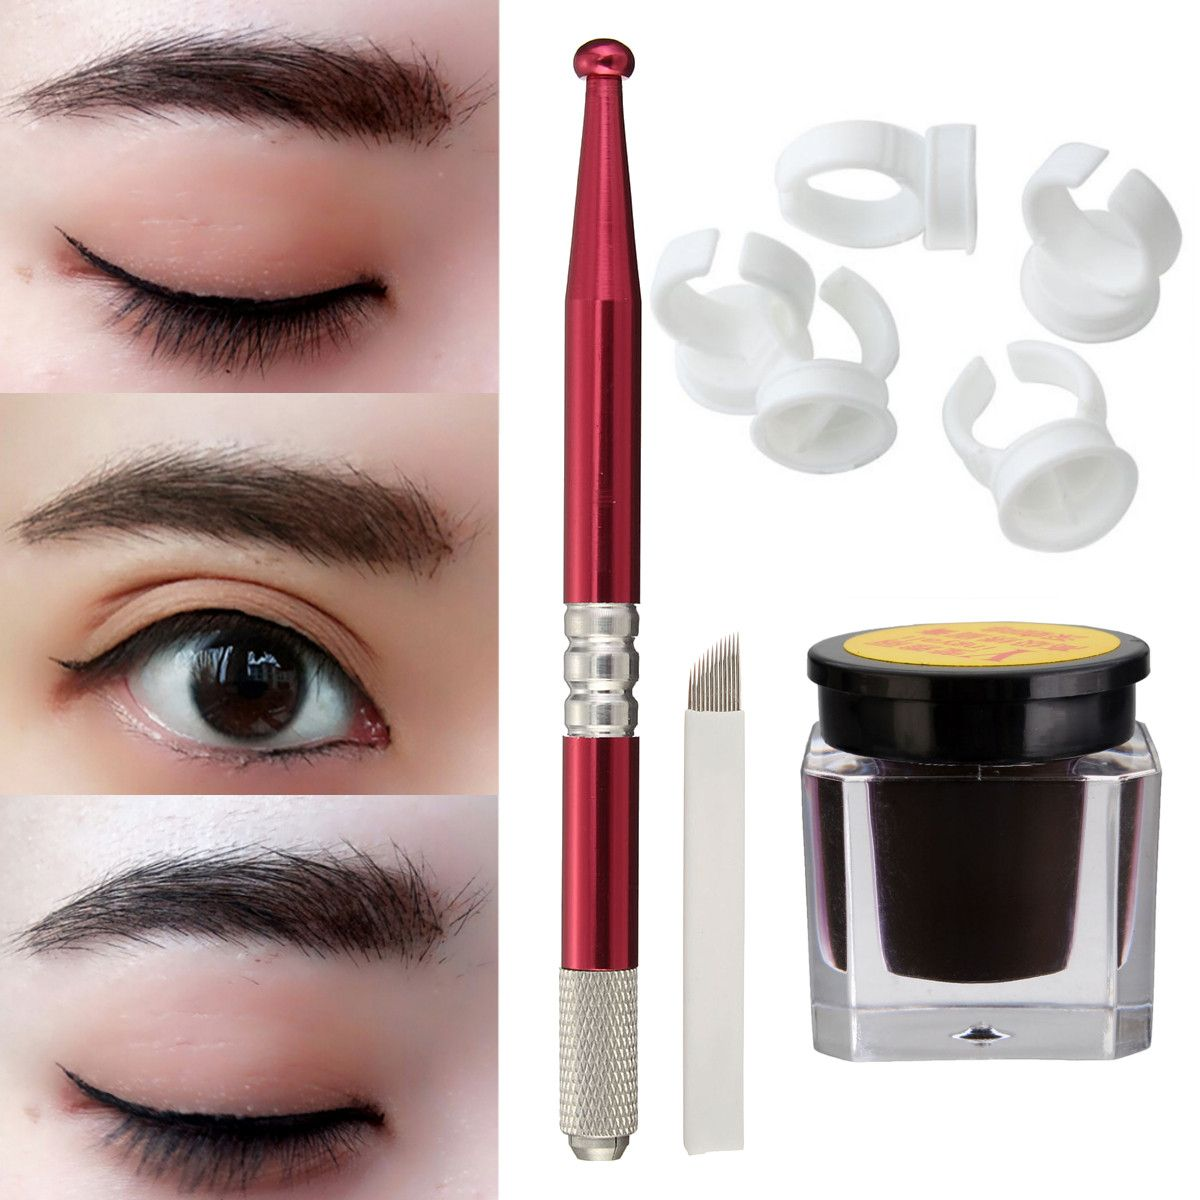 Pin on Beauty eyebrow